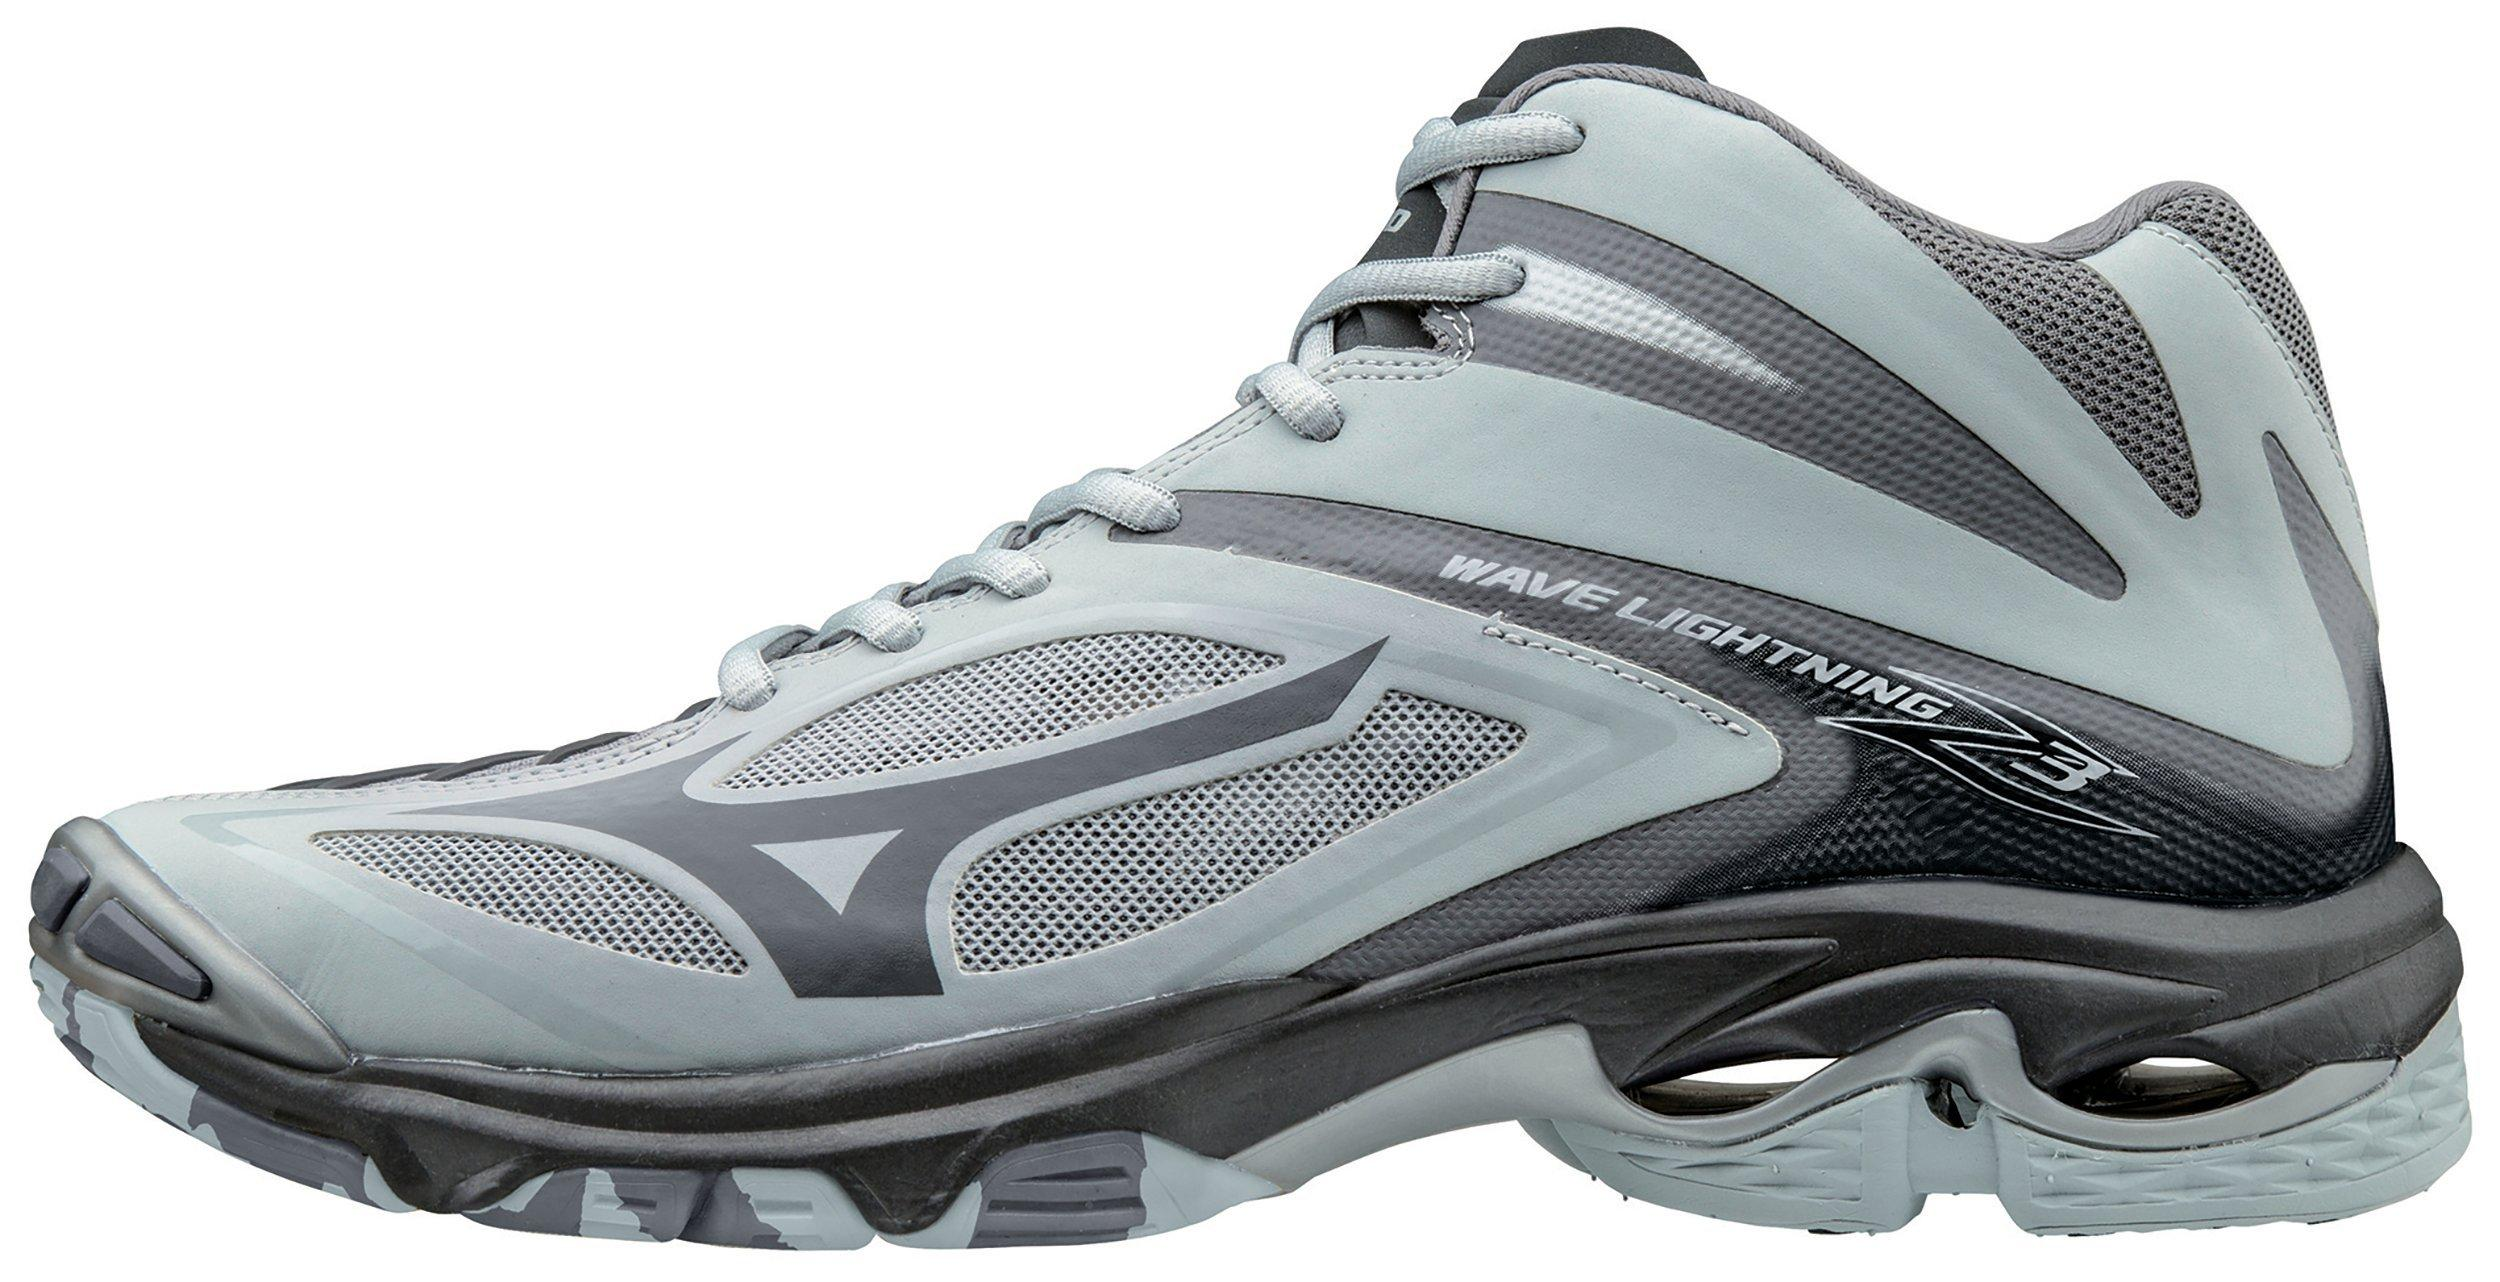 Mizuno Mens Volleyball Shoes - Men's Wave Lightning Z3 - Mid - 430227